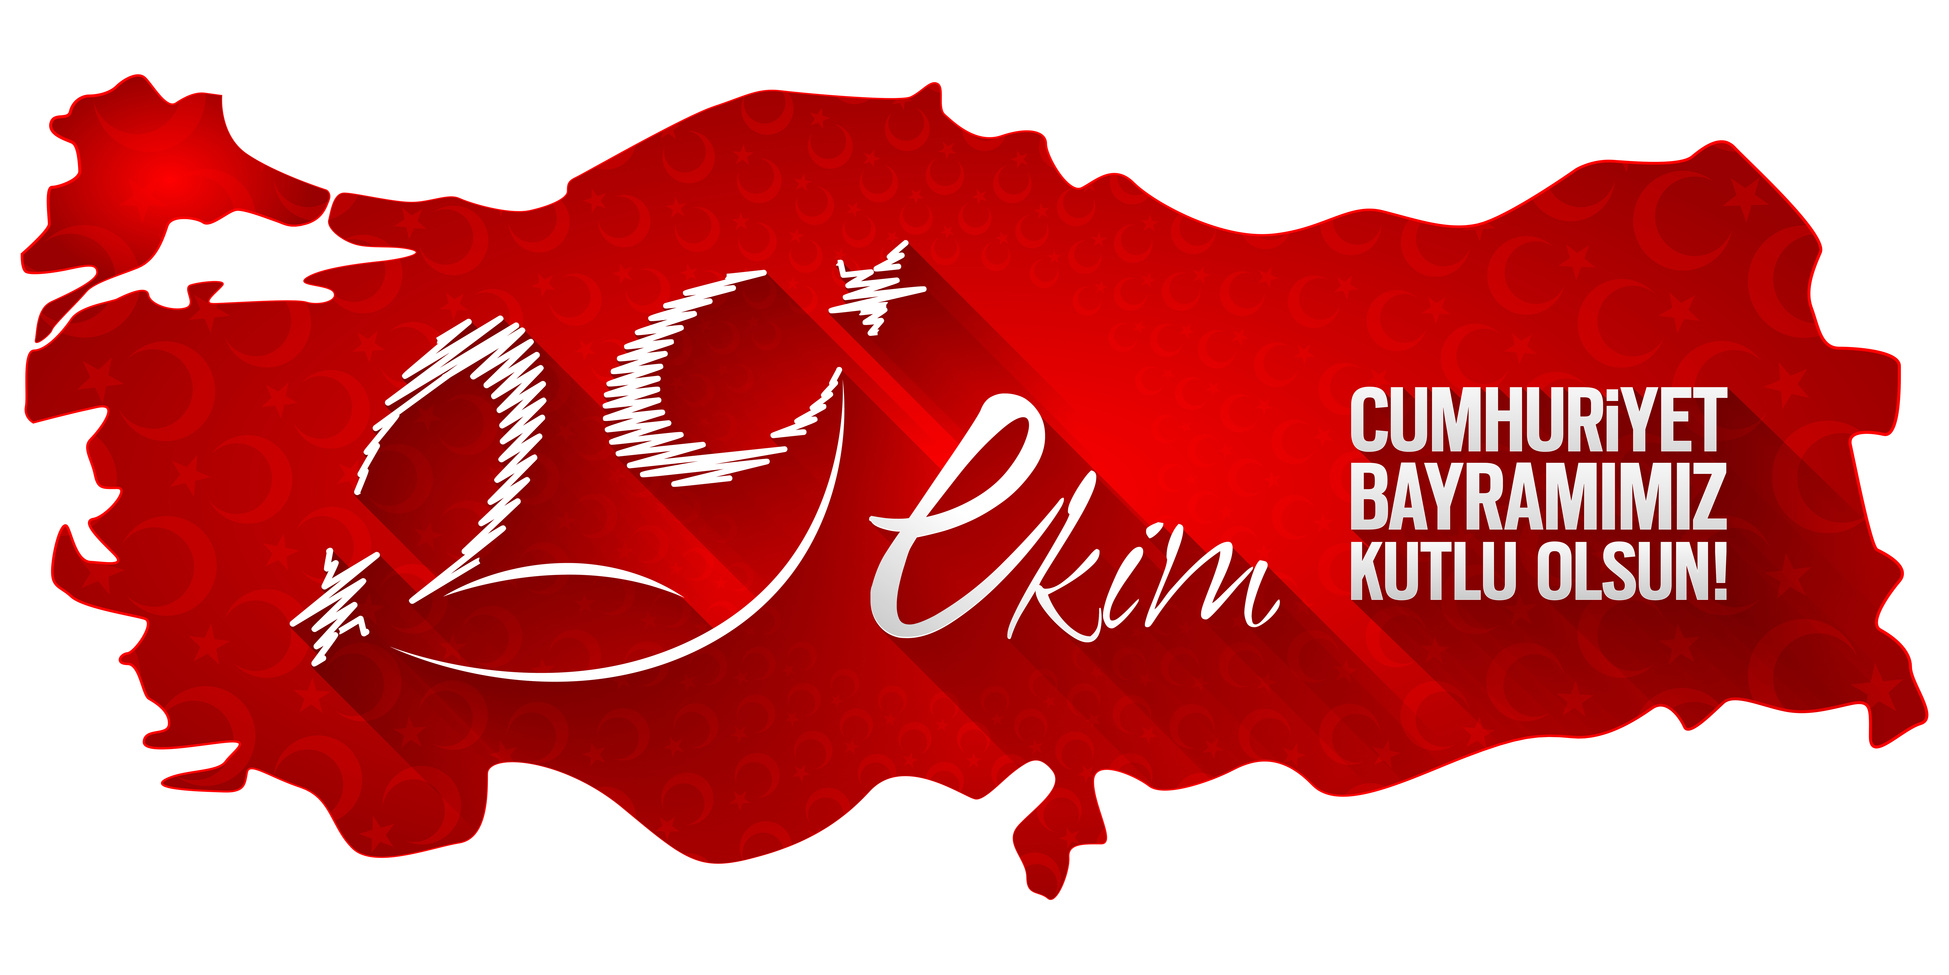 Tipografi almas; 29 Ekim Cumhuriyet Bayram